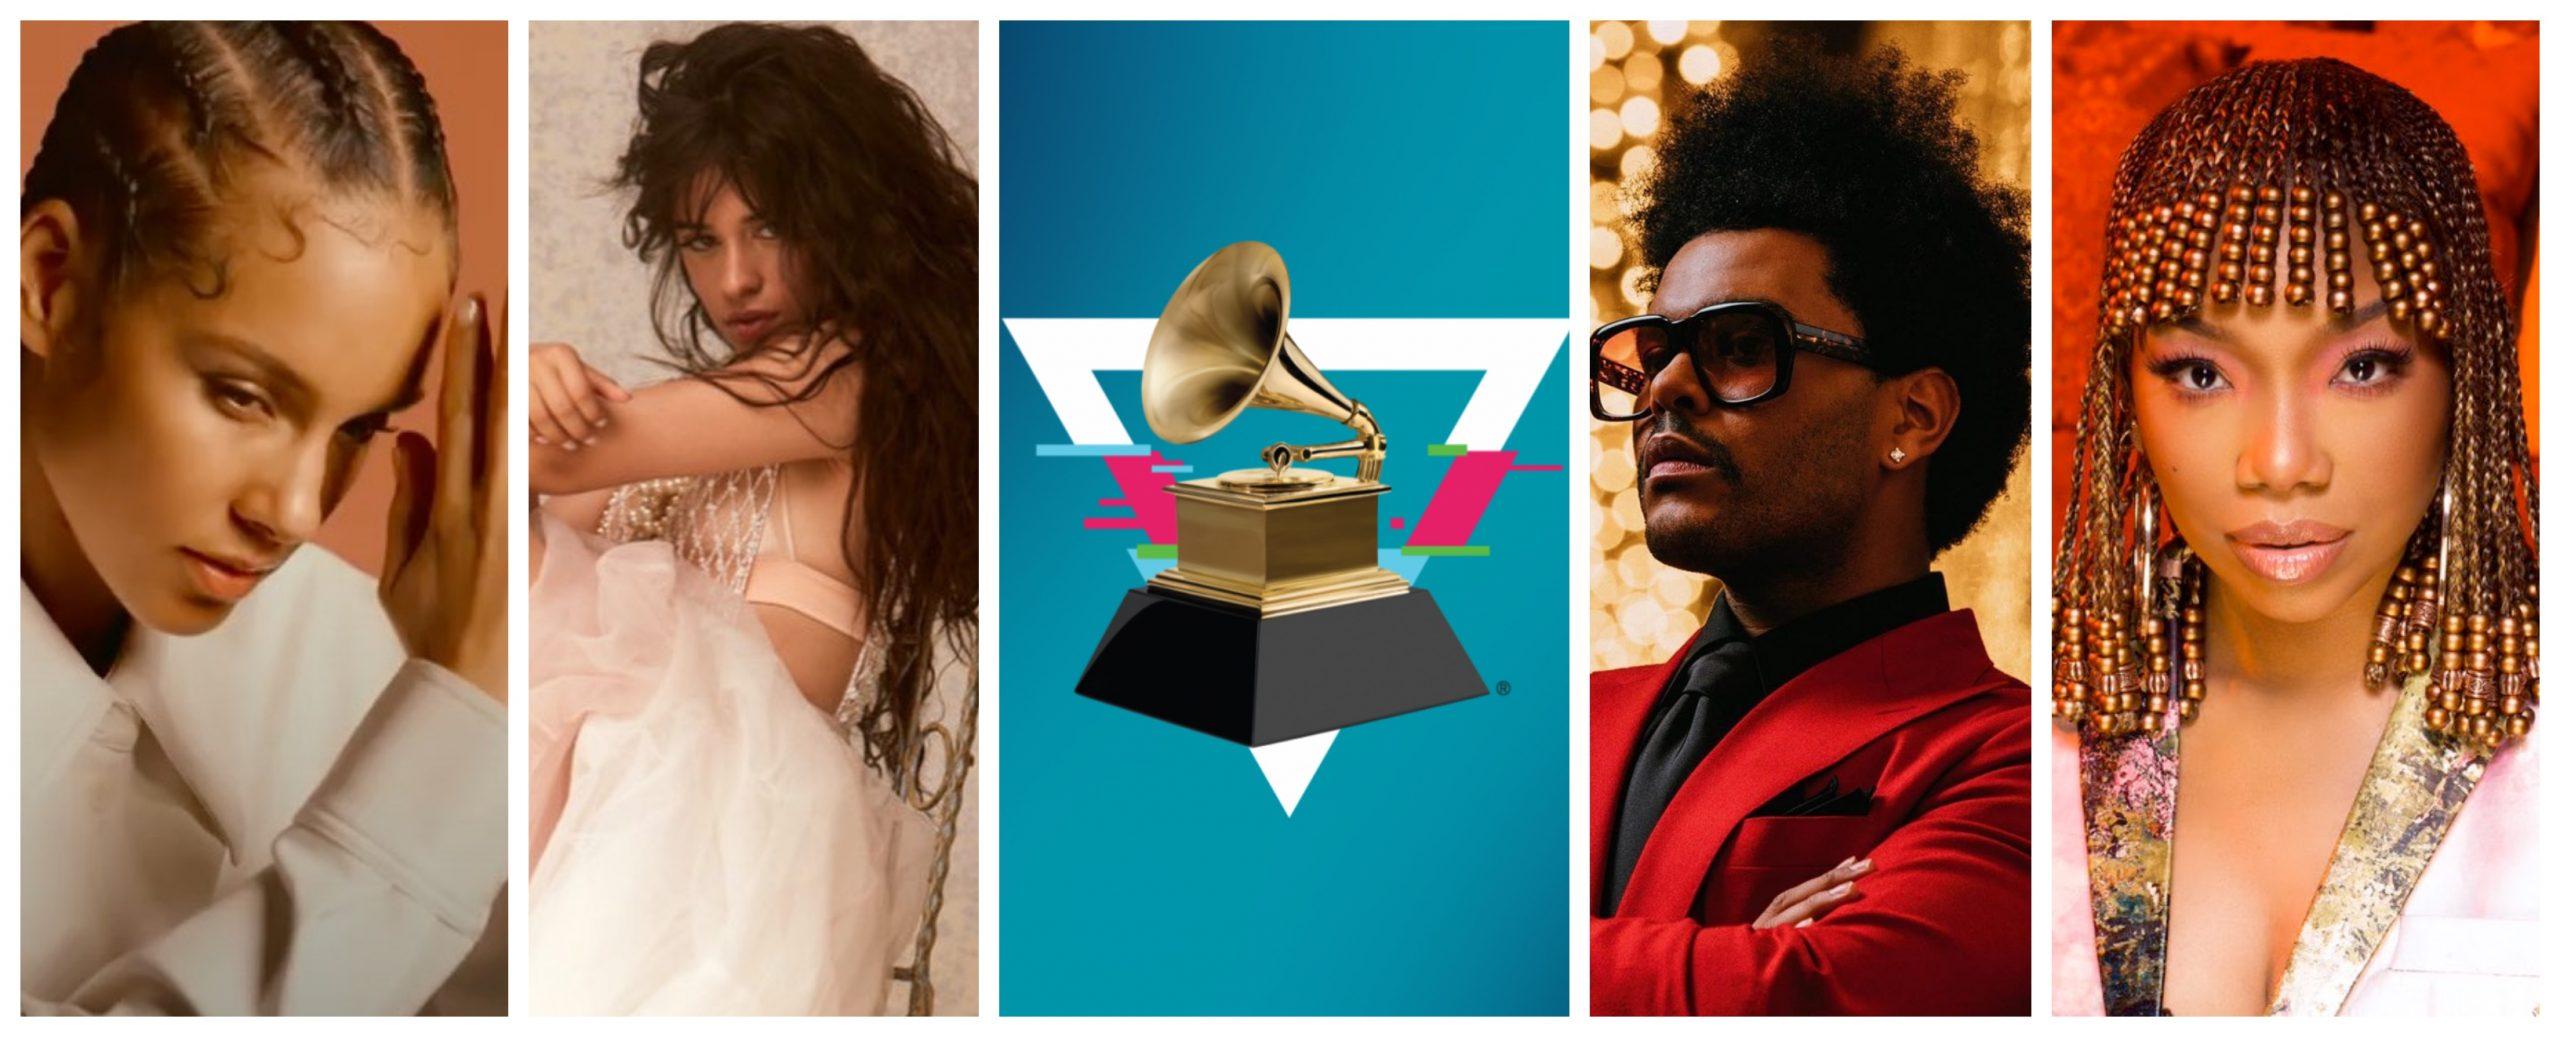 grammy nominations 2021 - photo #6